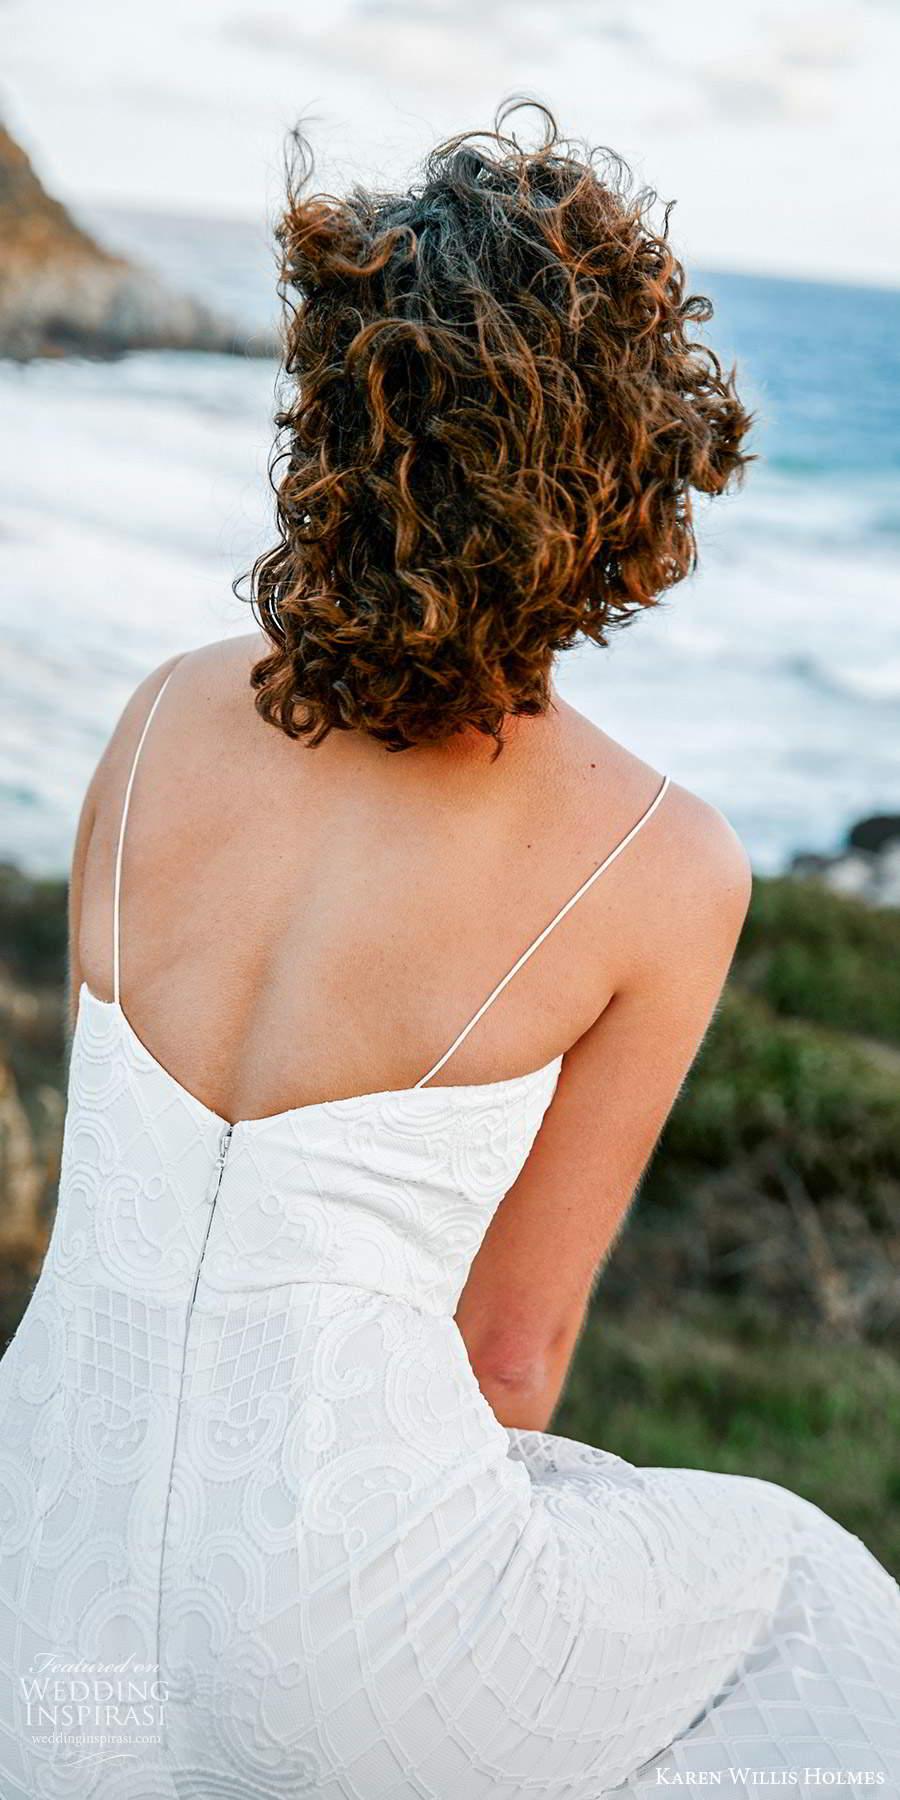 karen willis holmes 2020 bridal sleeveless thin straps v neckline embellished sheath wedding dress chapel train (6) bv